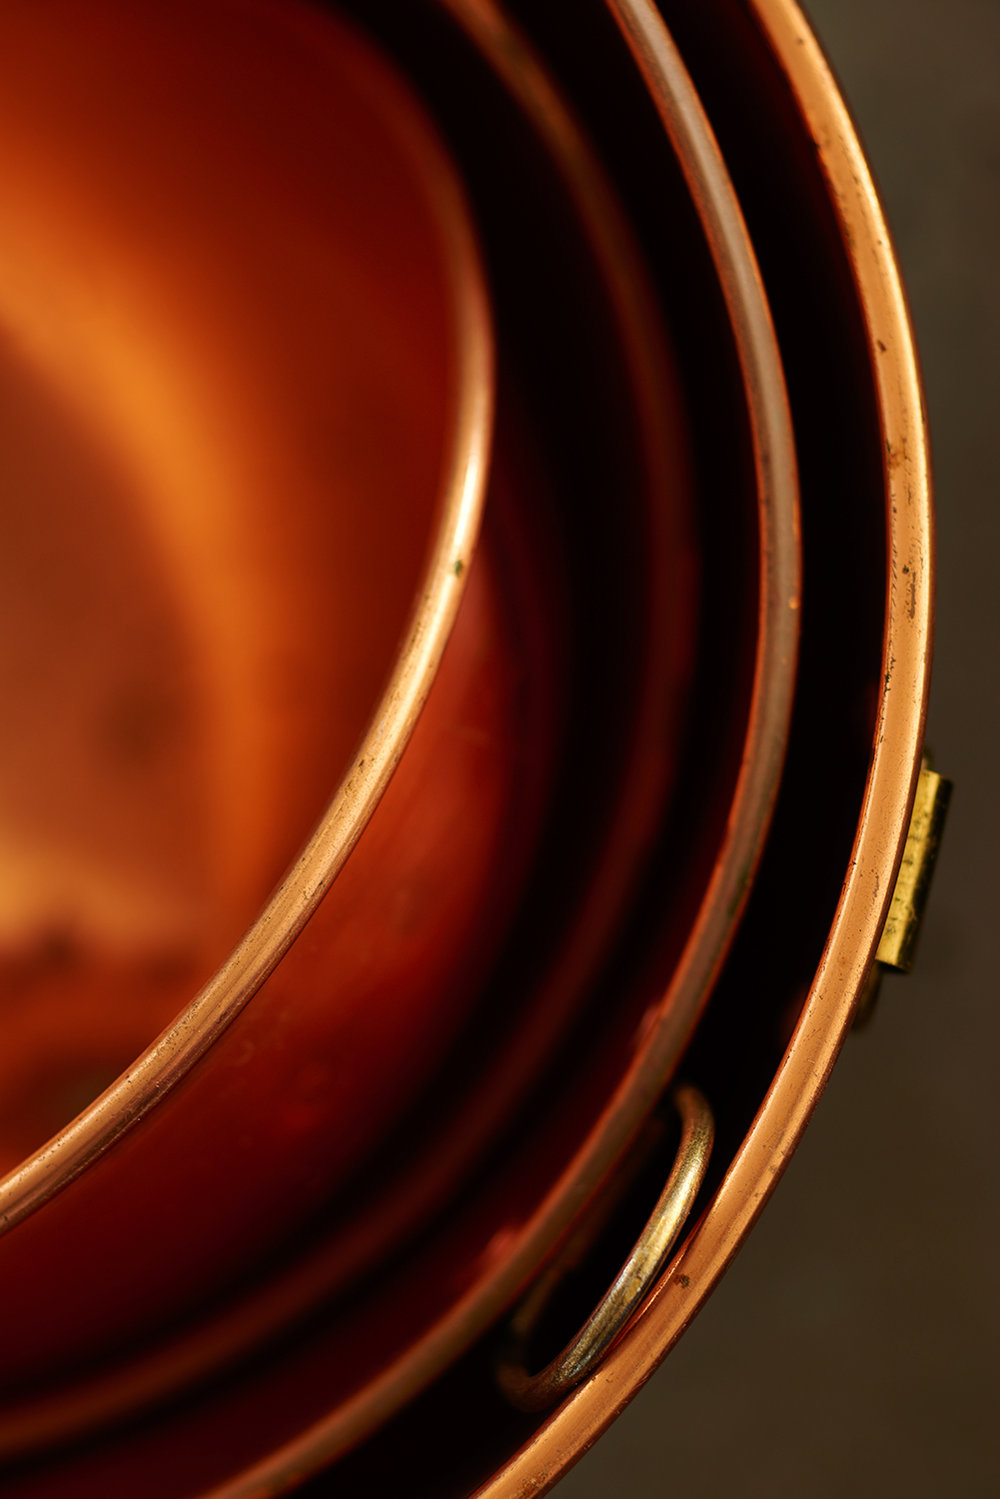 copper-pots-concrete-modern_0095_original.jpg